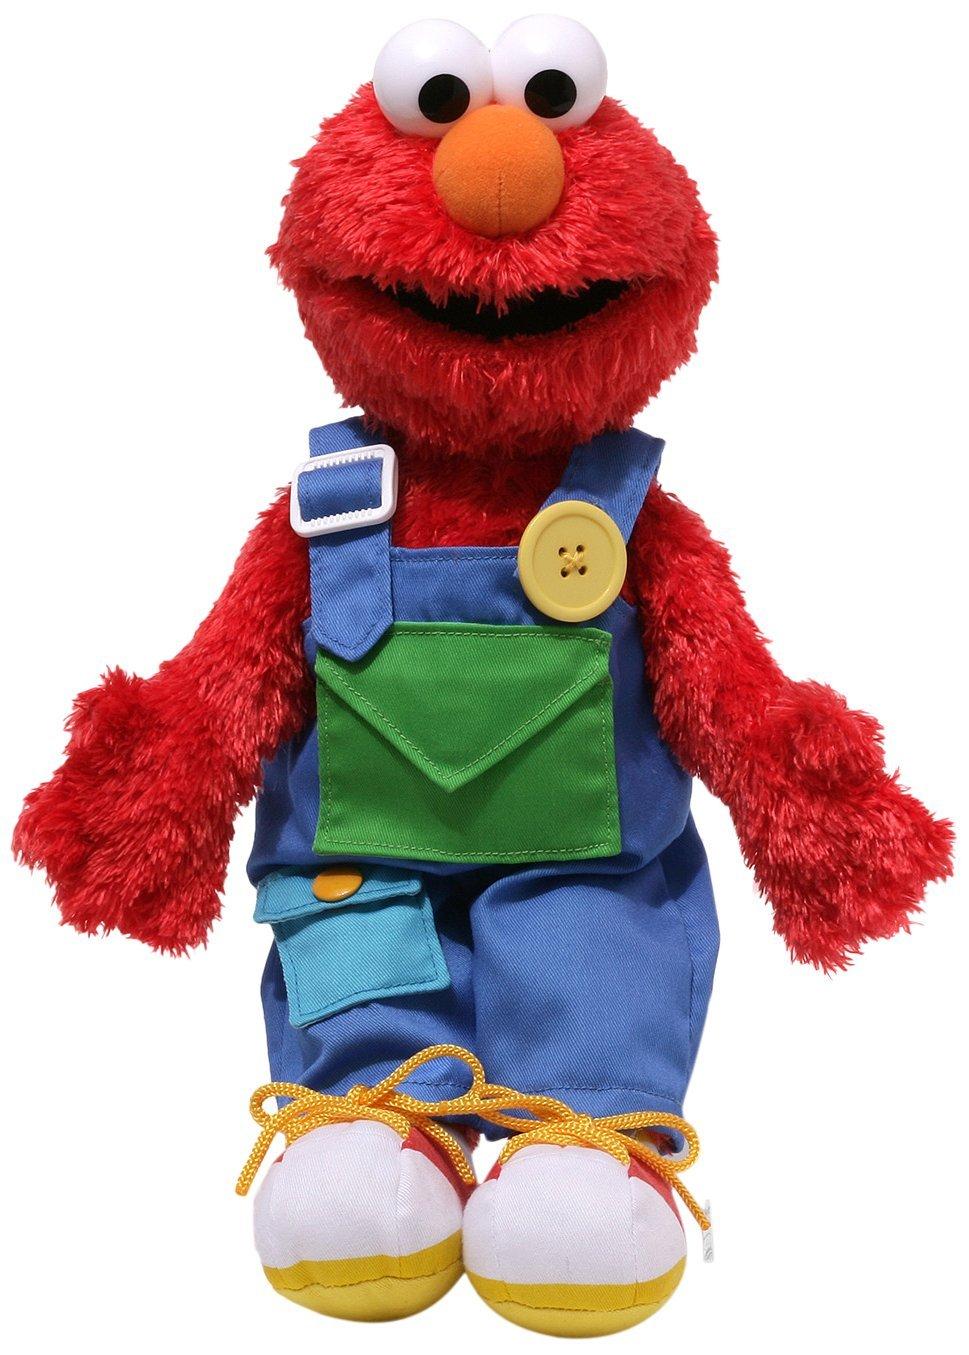 Sesame Street Teach Me Elmo Stuffed Animal, Overall straps button By GUND From USA by GUND